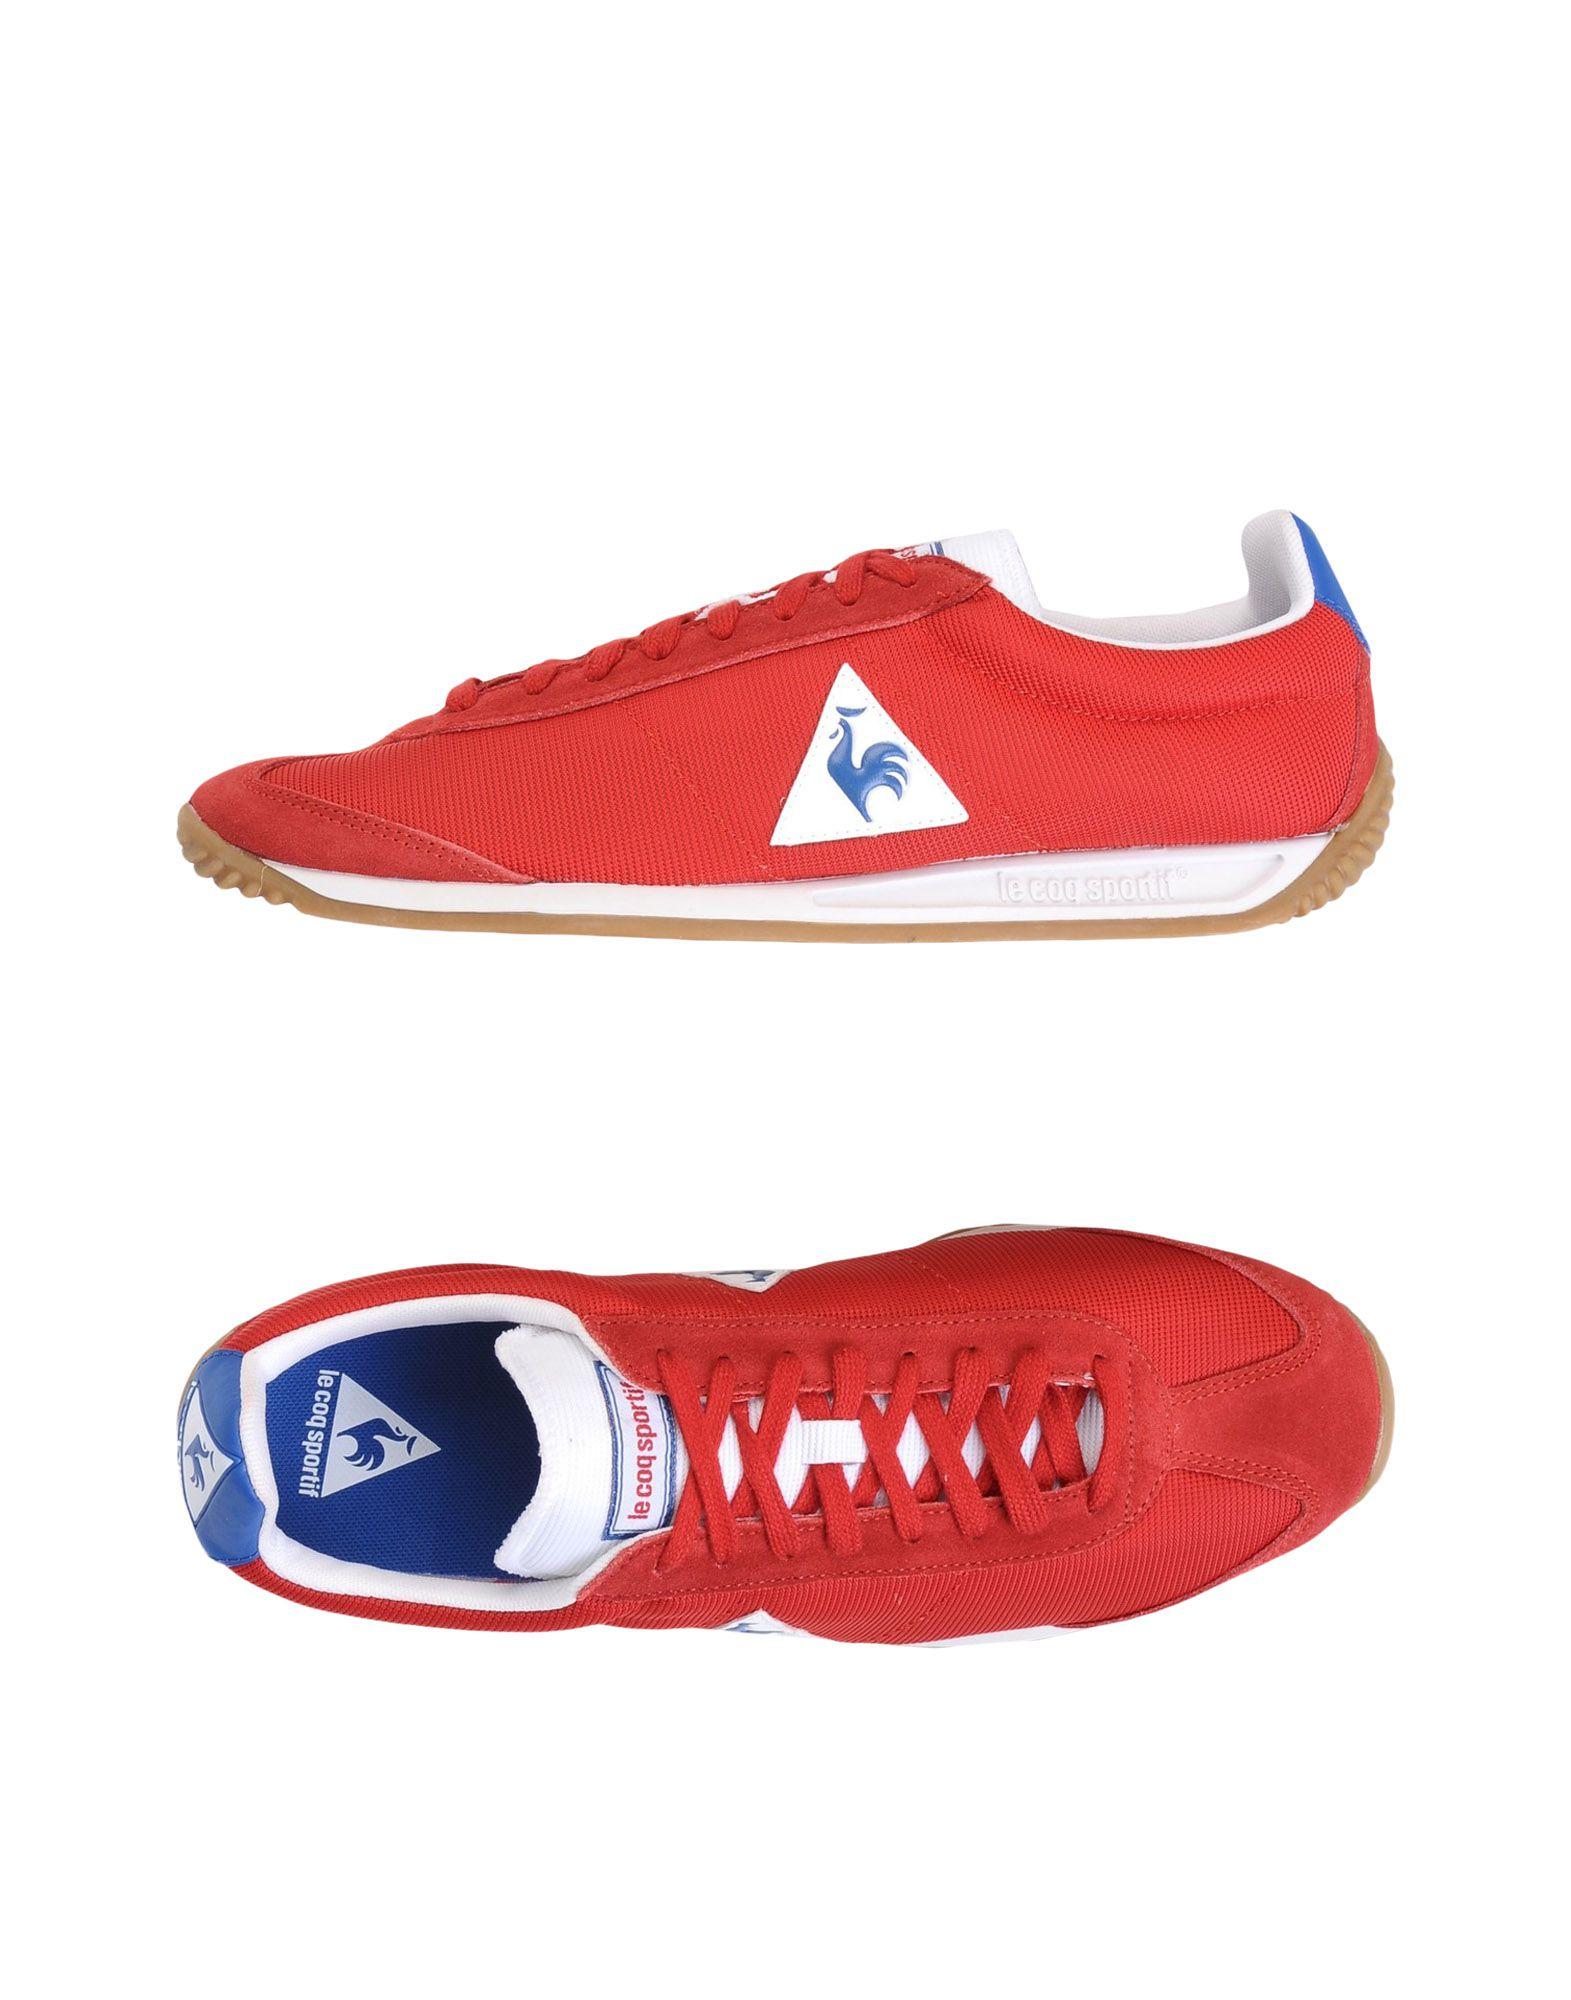 337574a35376 Le Coq Sportif Quartz Nylon Gum - Sneakers - Men Le Coq Sportif ...